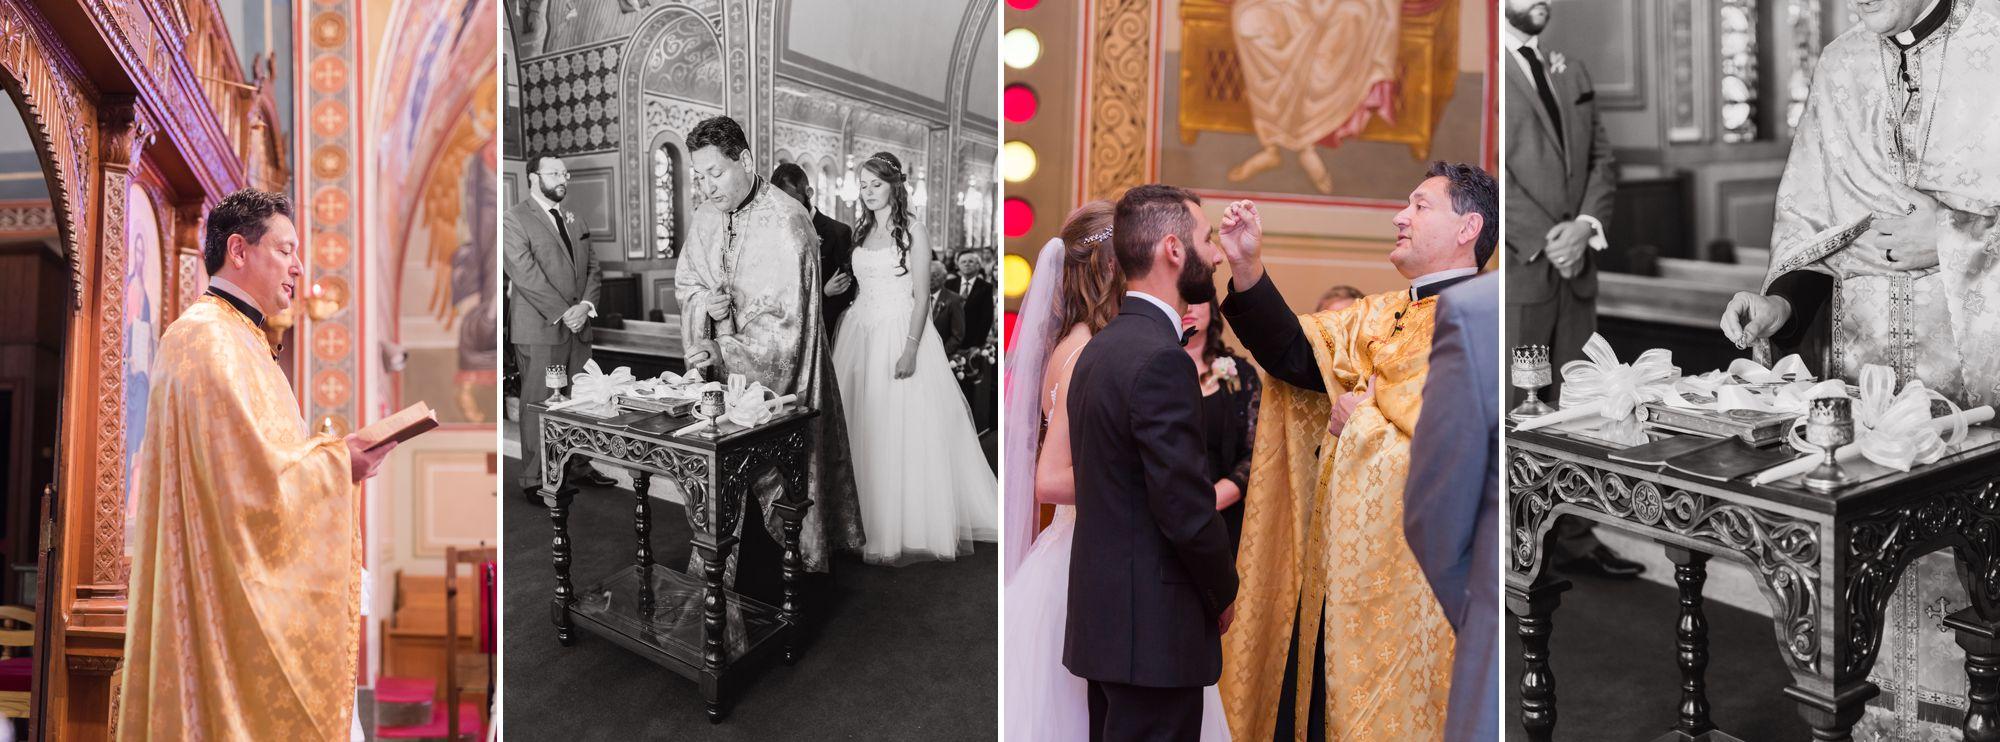 uptown-charlotte-orthodox-greek-wedding 56